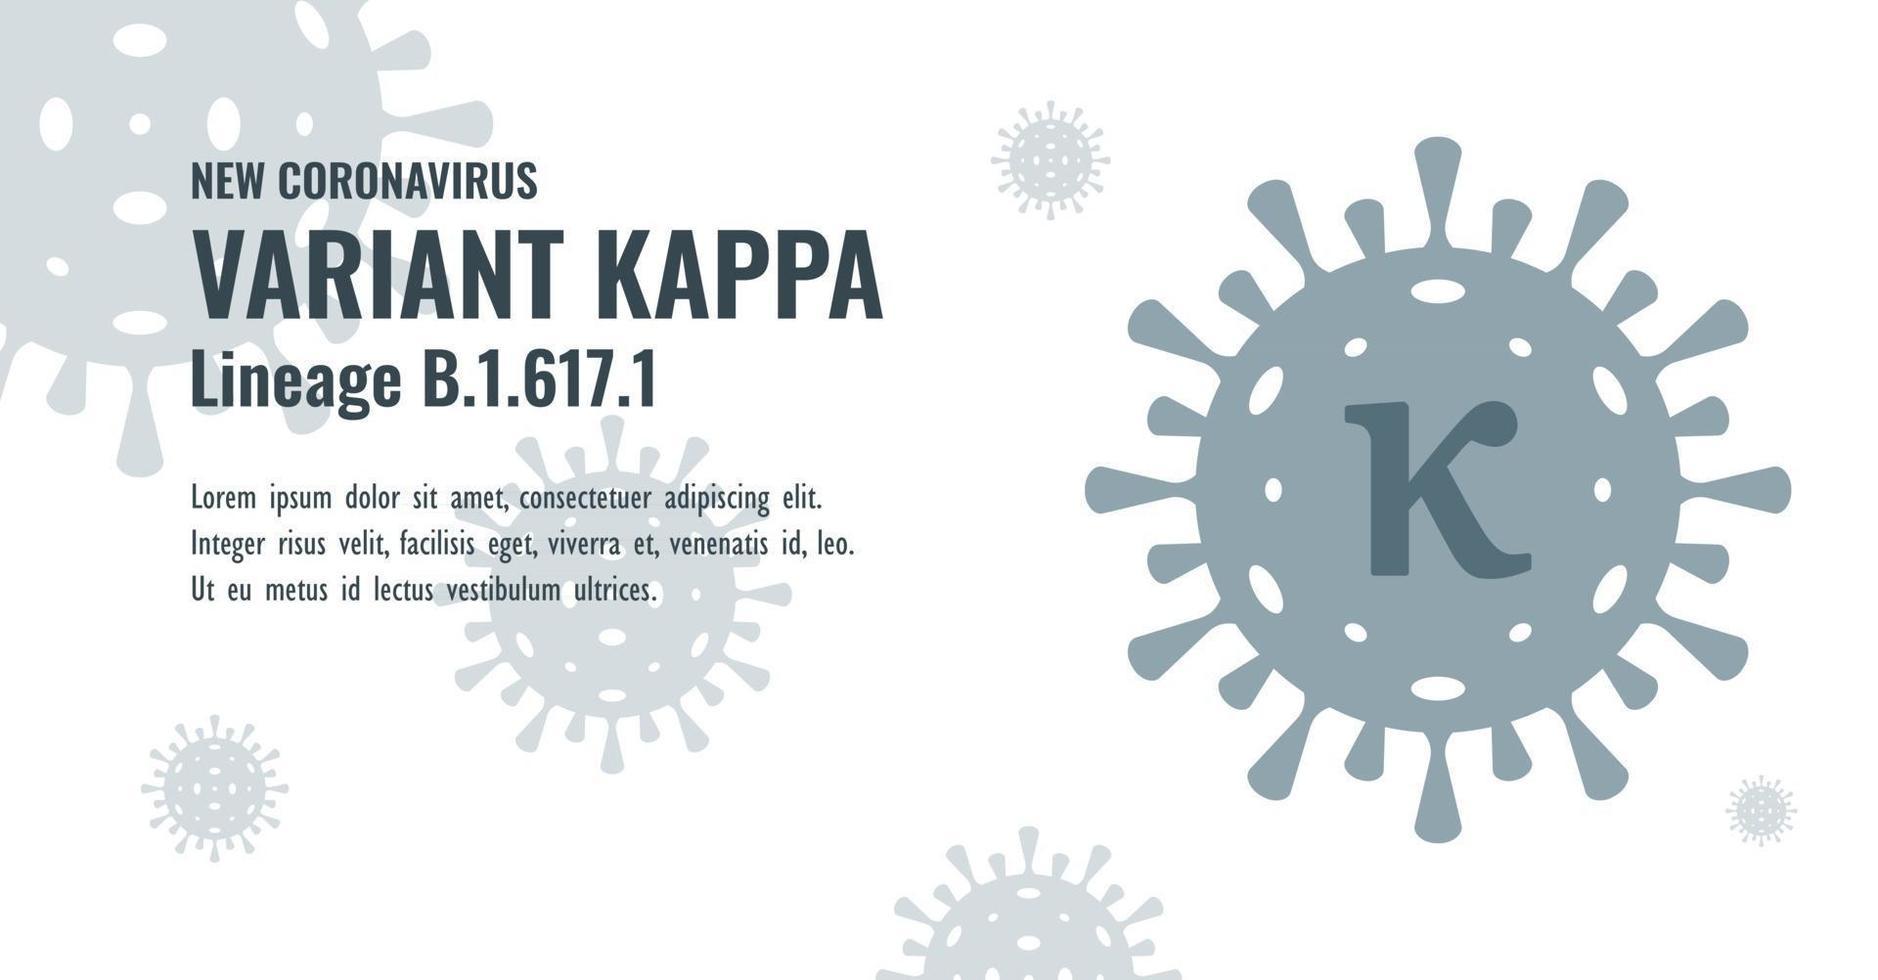 New Coronavirus or SARS-CoV-2 Variant Kappa B.1.617.1 Illustration vector